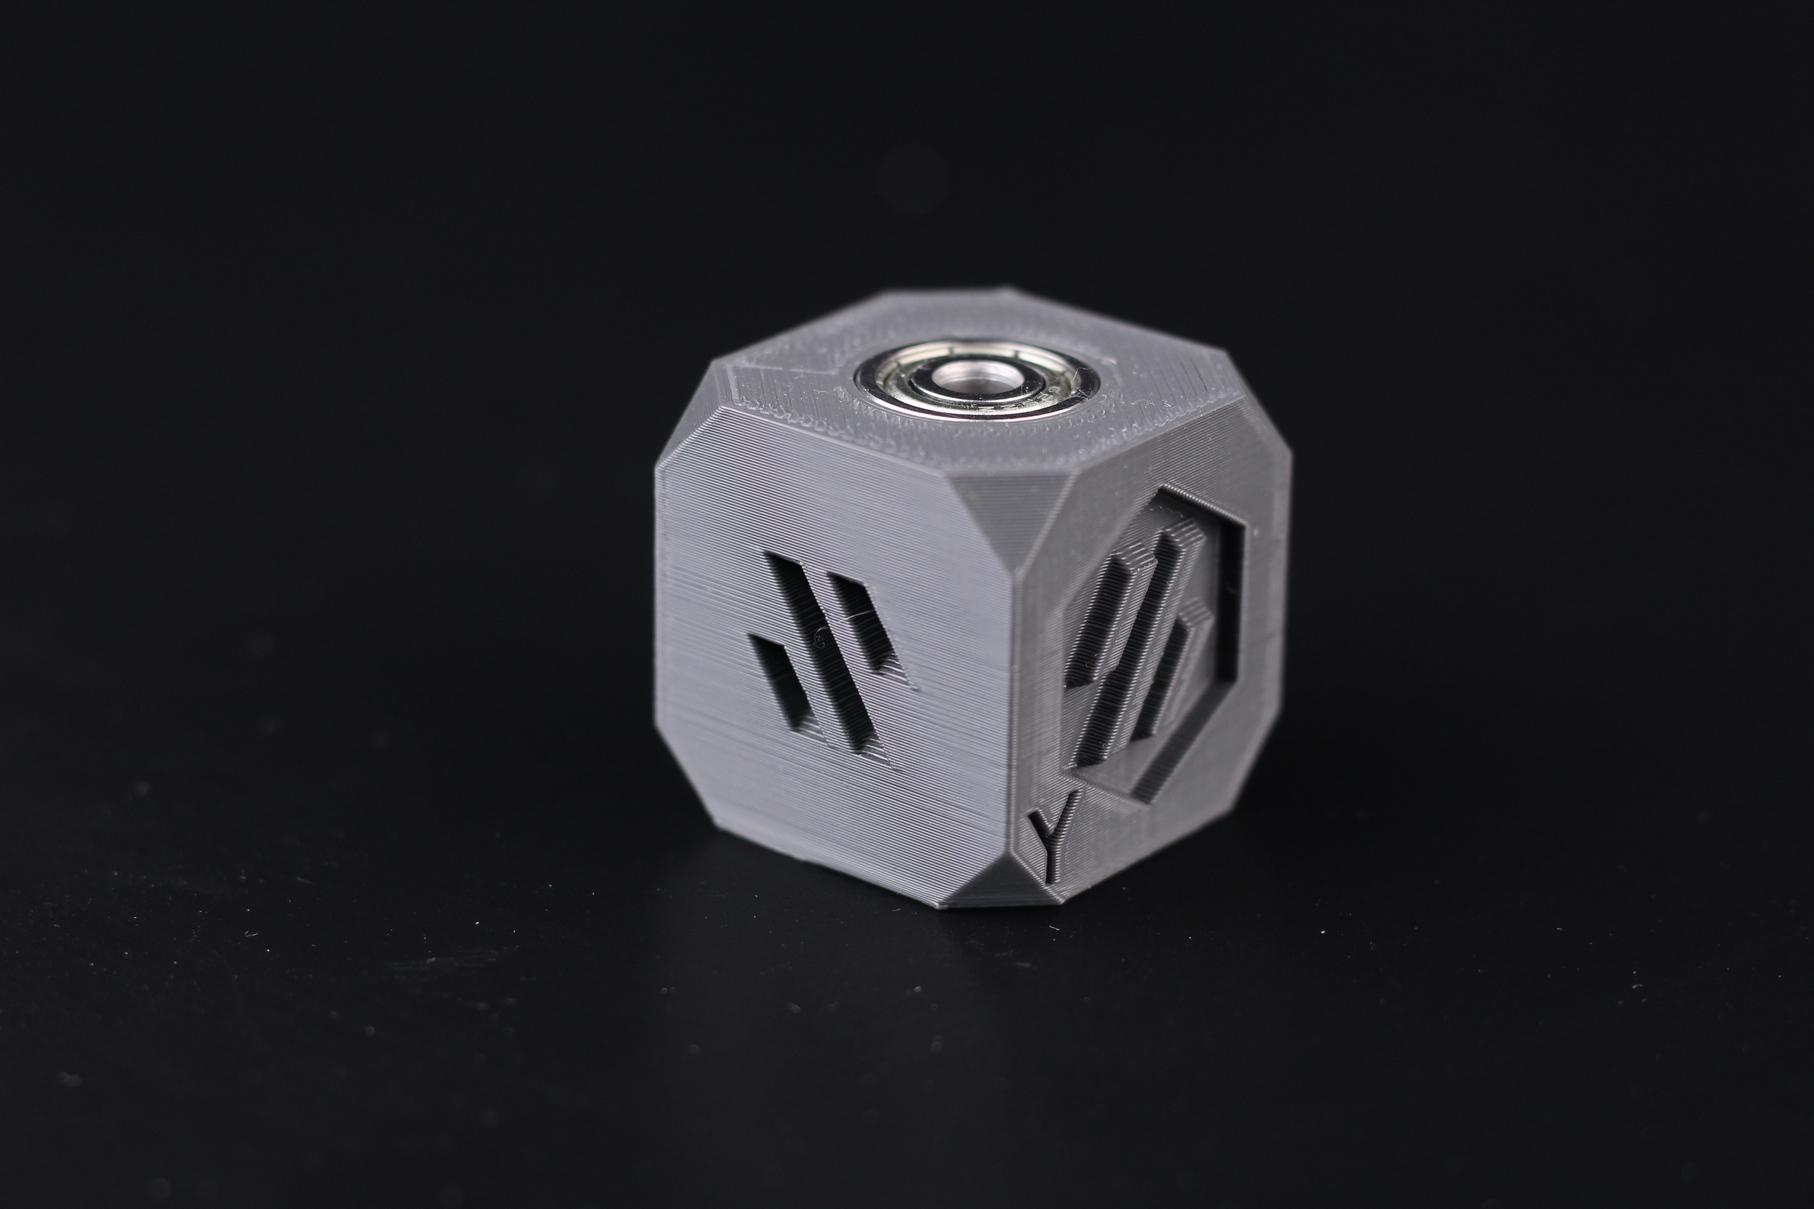 Voron-Cube-printed-on-Ender-3-Max-3